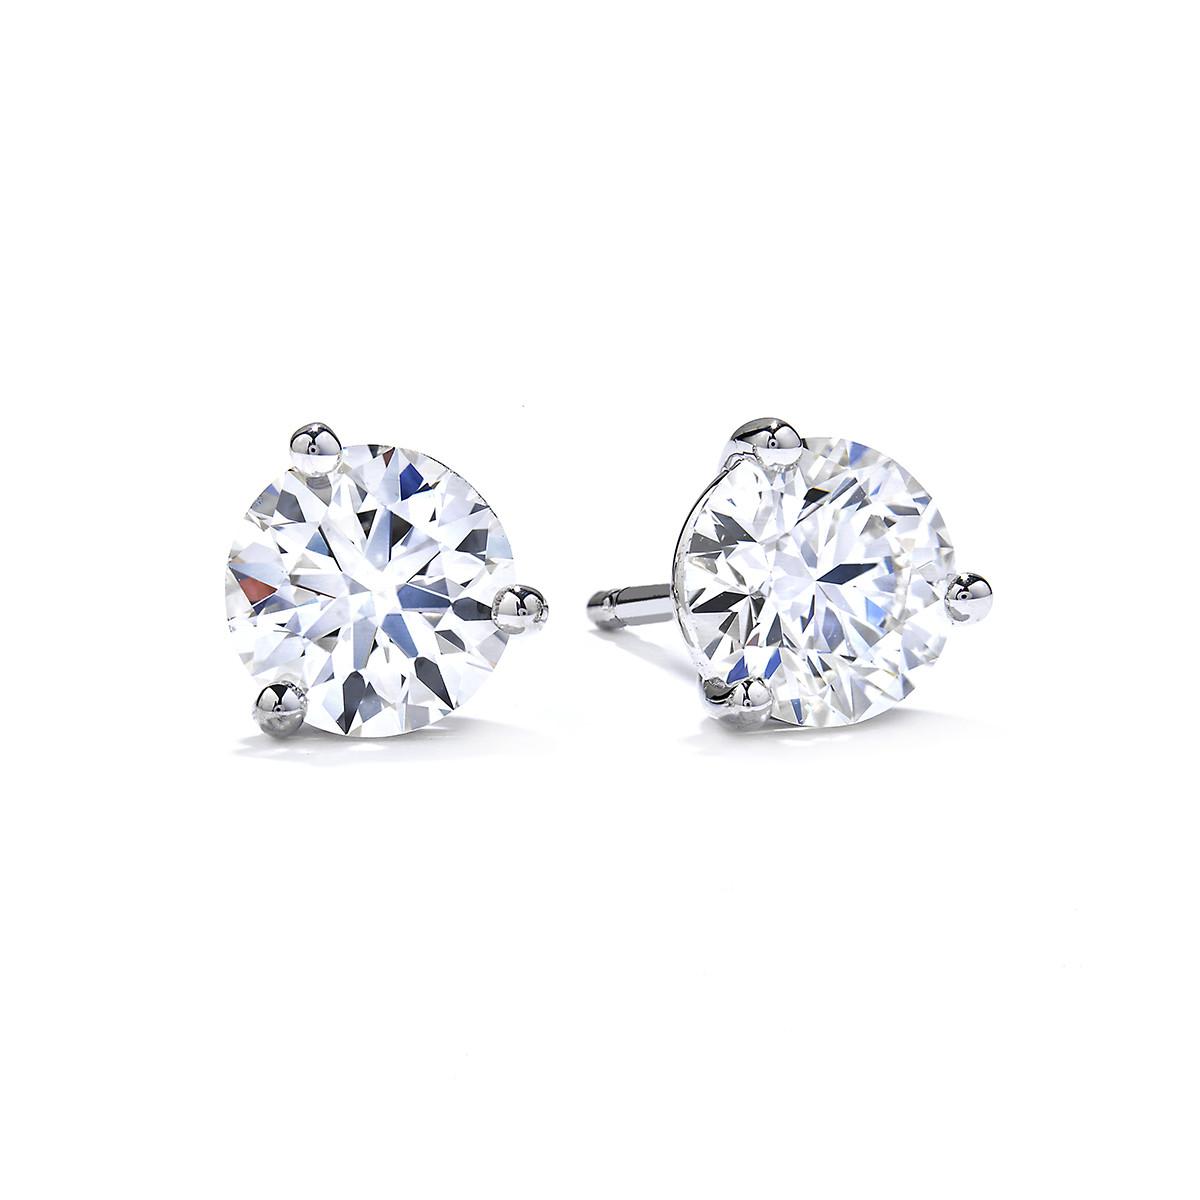 New Hearts On Fire® 1.44 CTW Diamond Select Stud Earrings